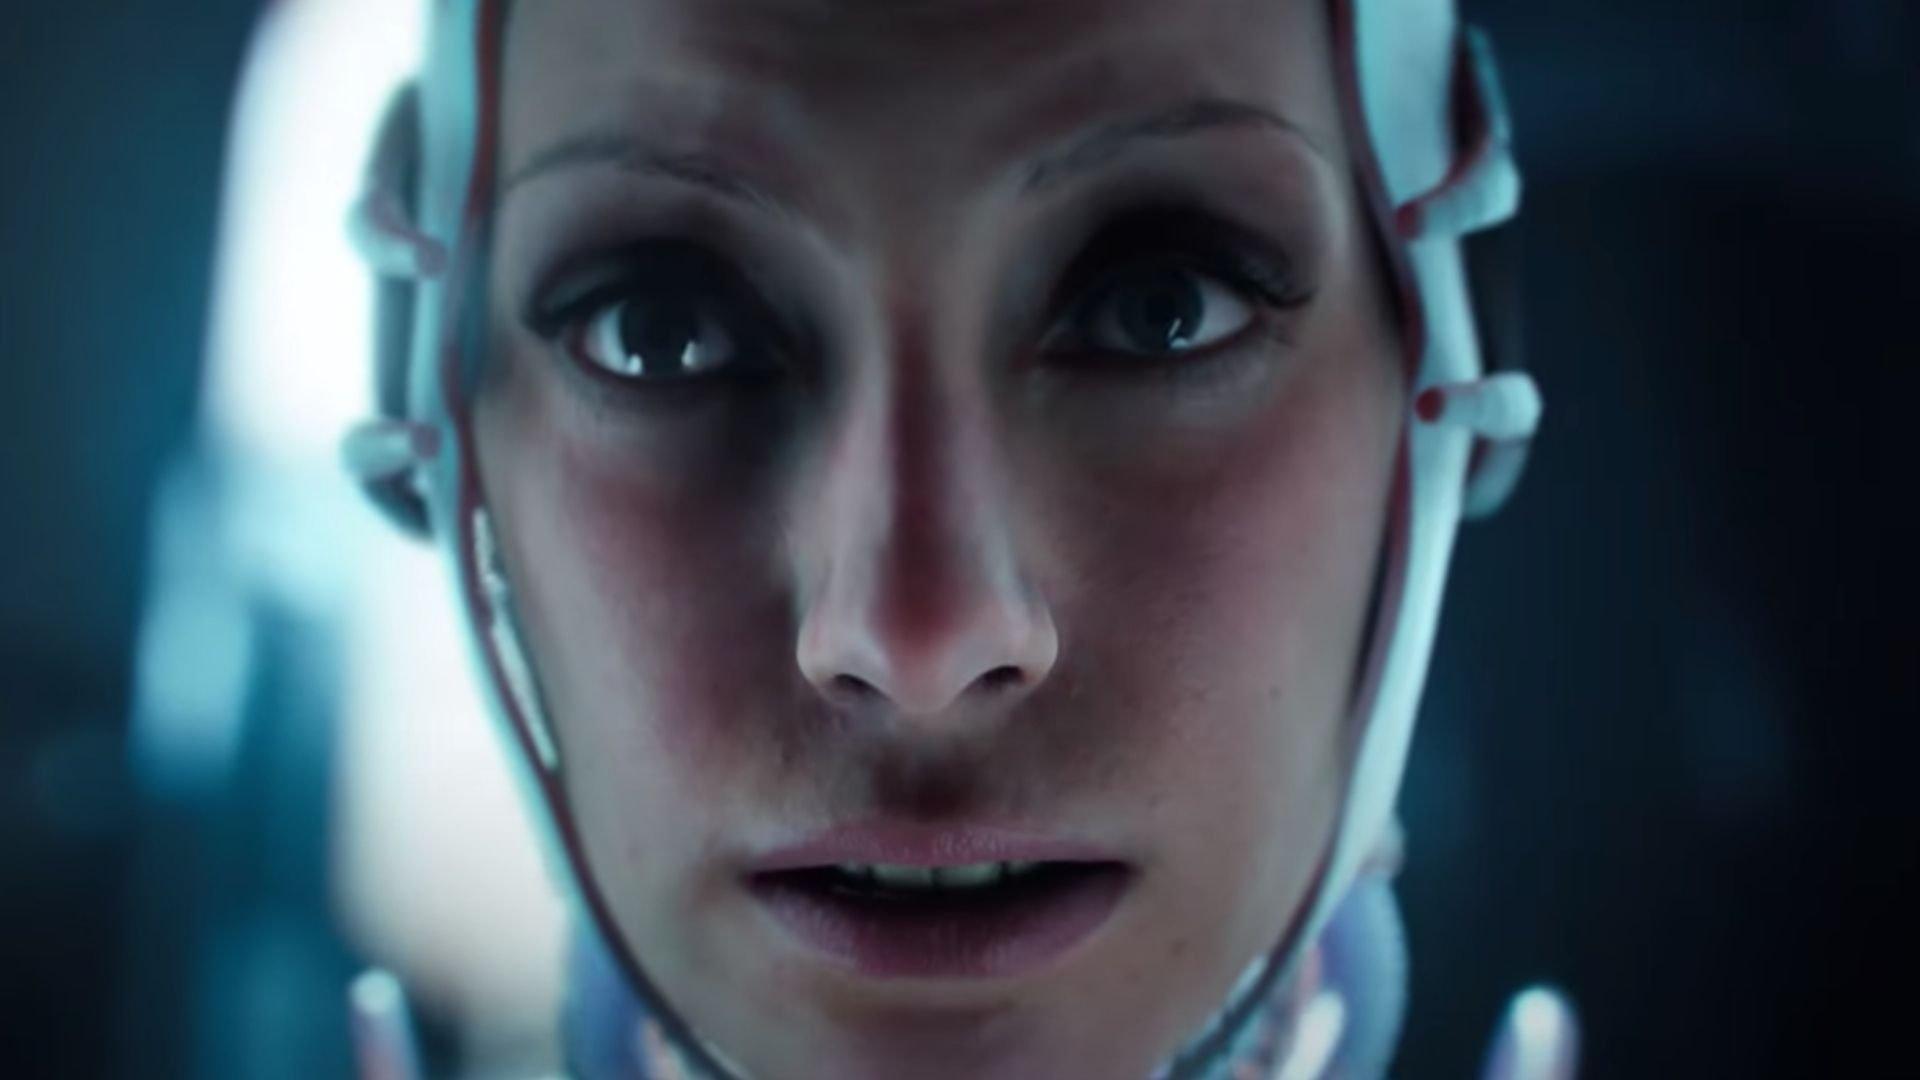 Unreal Engine Short Film